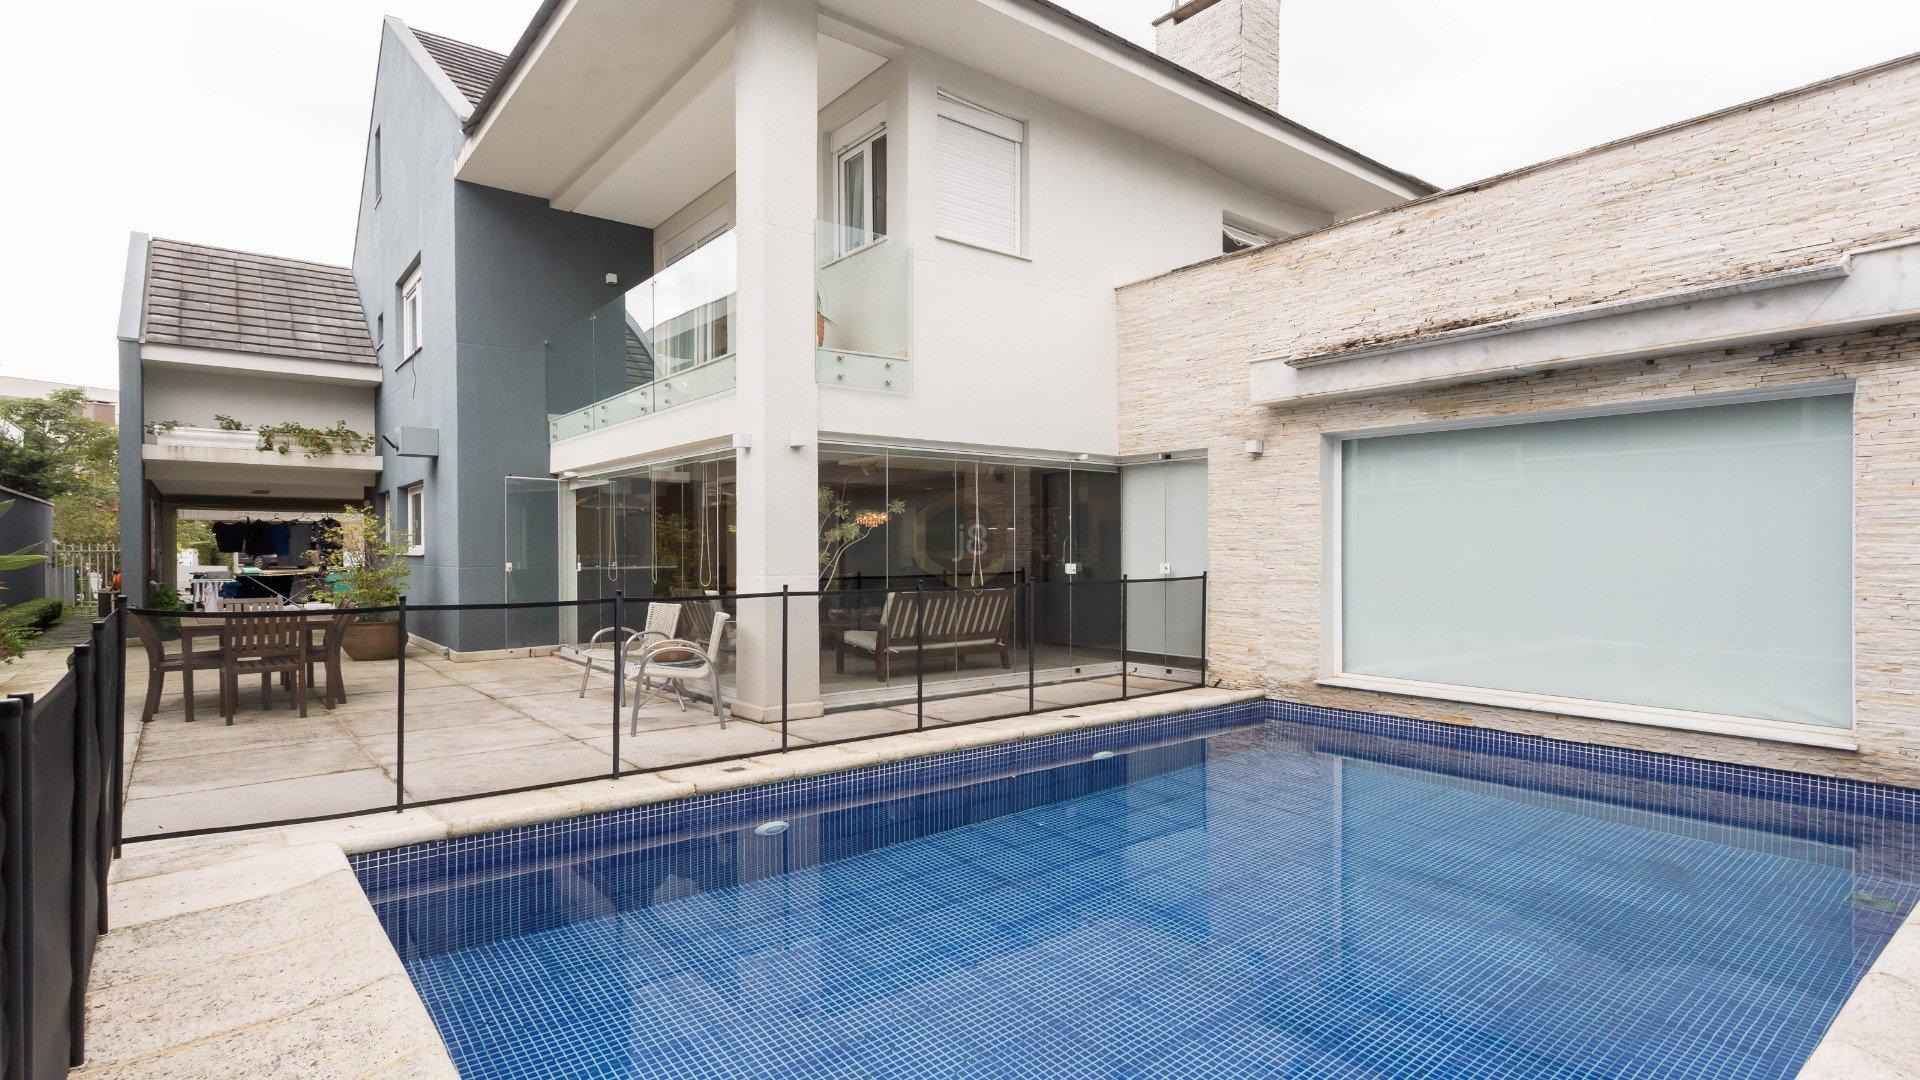 Foto de destaque Charmosa casa c/ piscina no paysage provence !